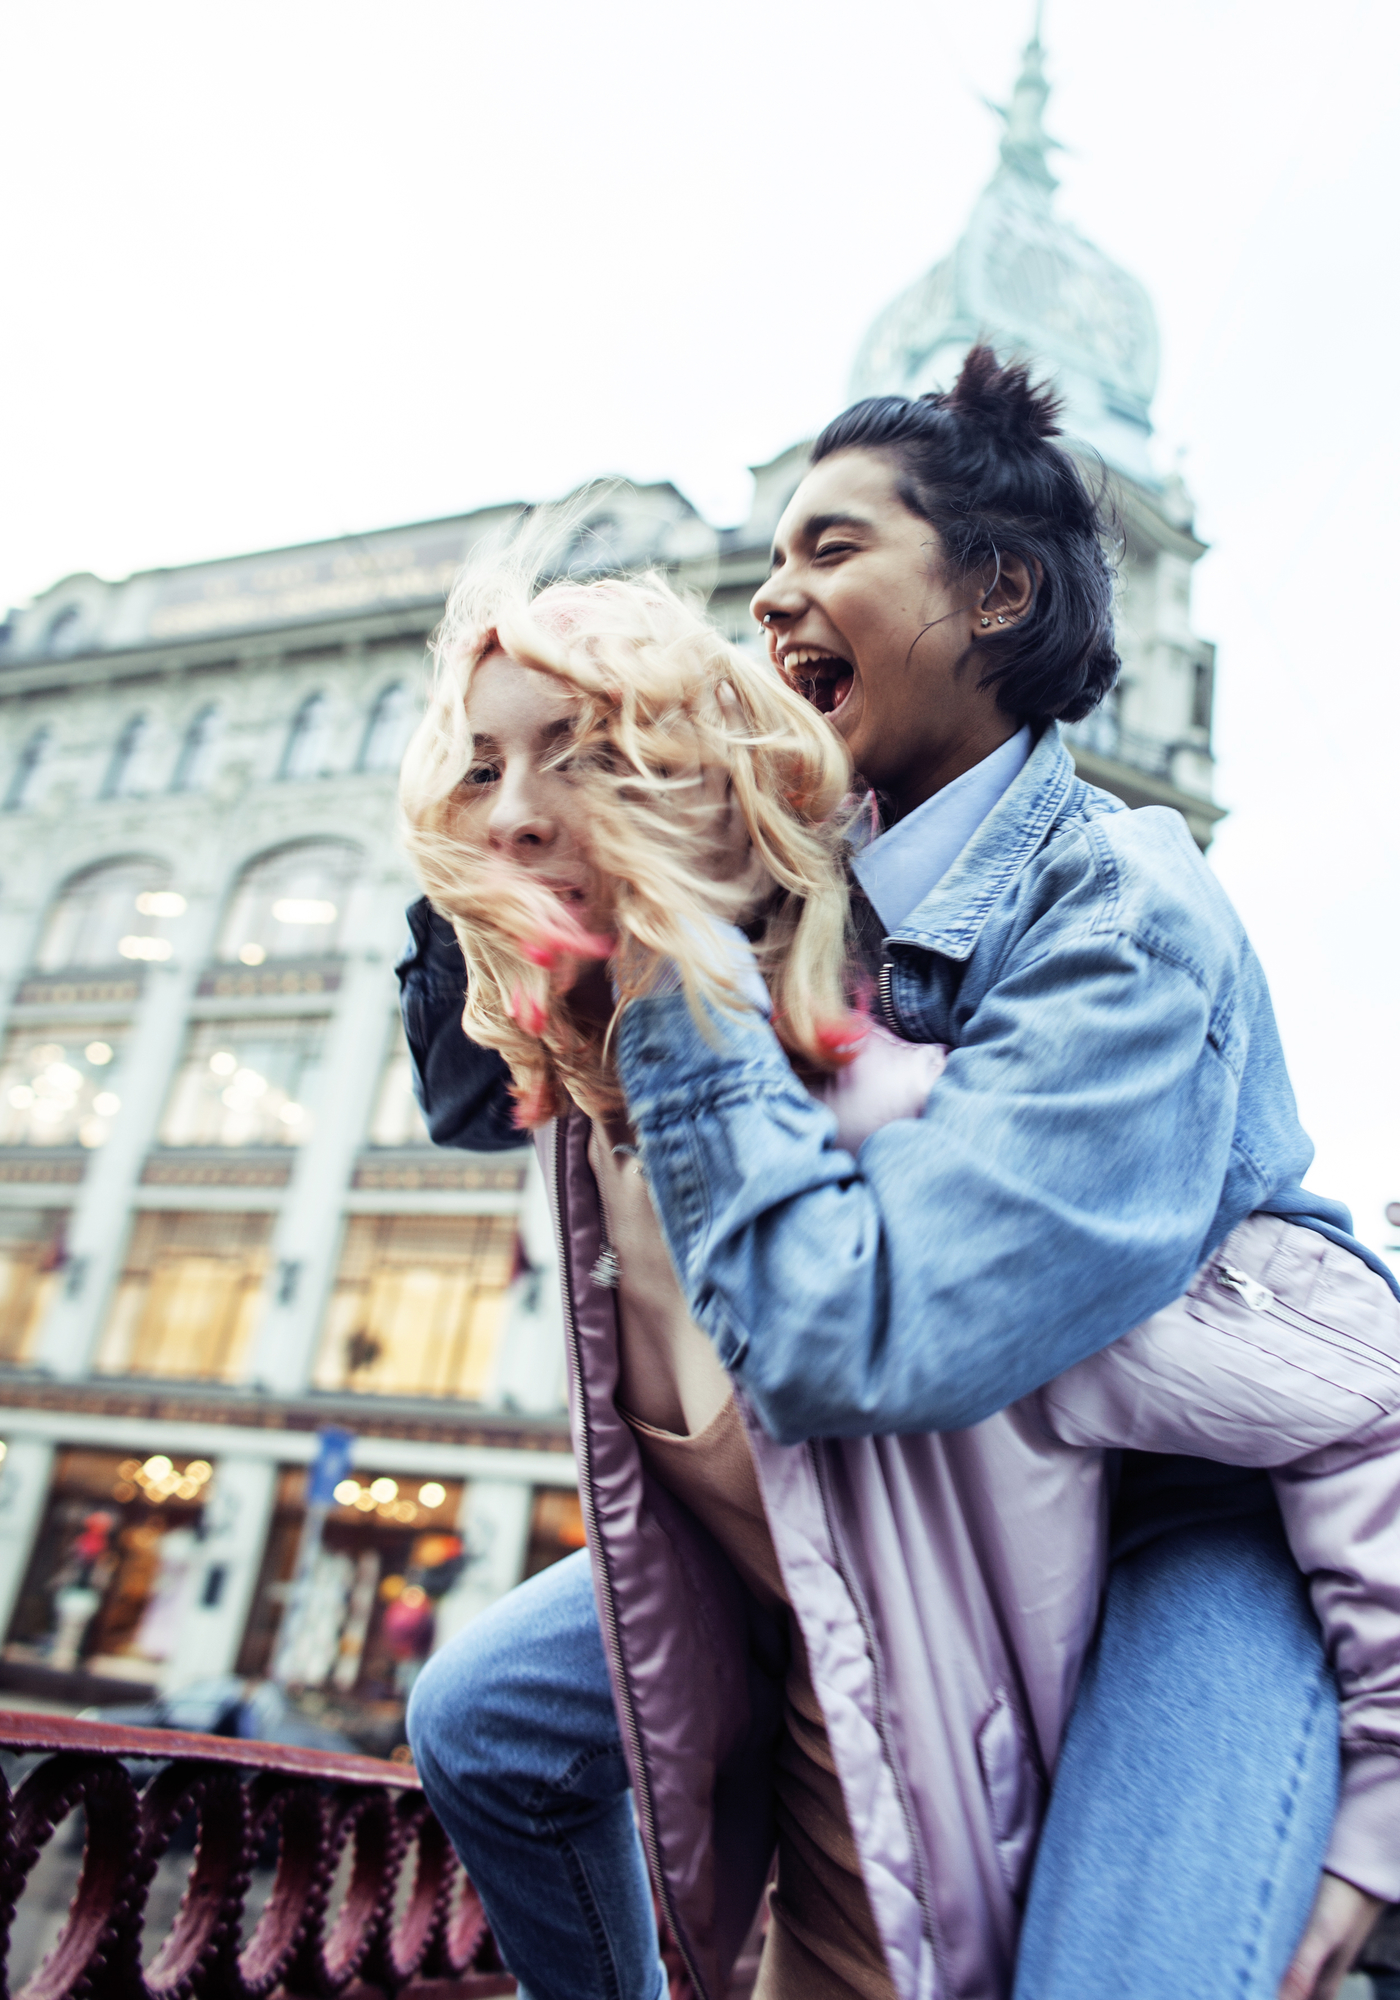 cute young couple of teenagers girlfriends having fun, traveling